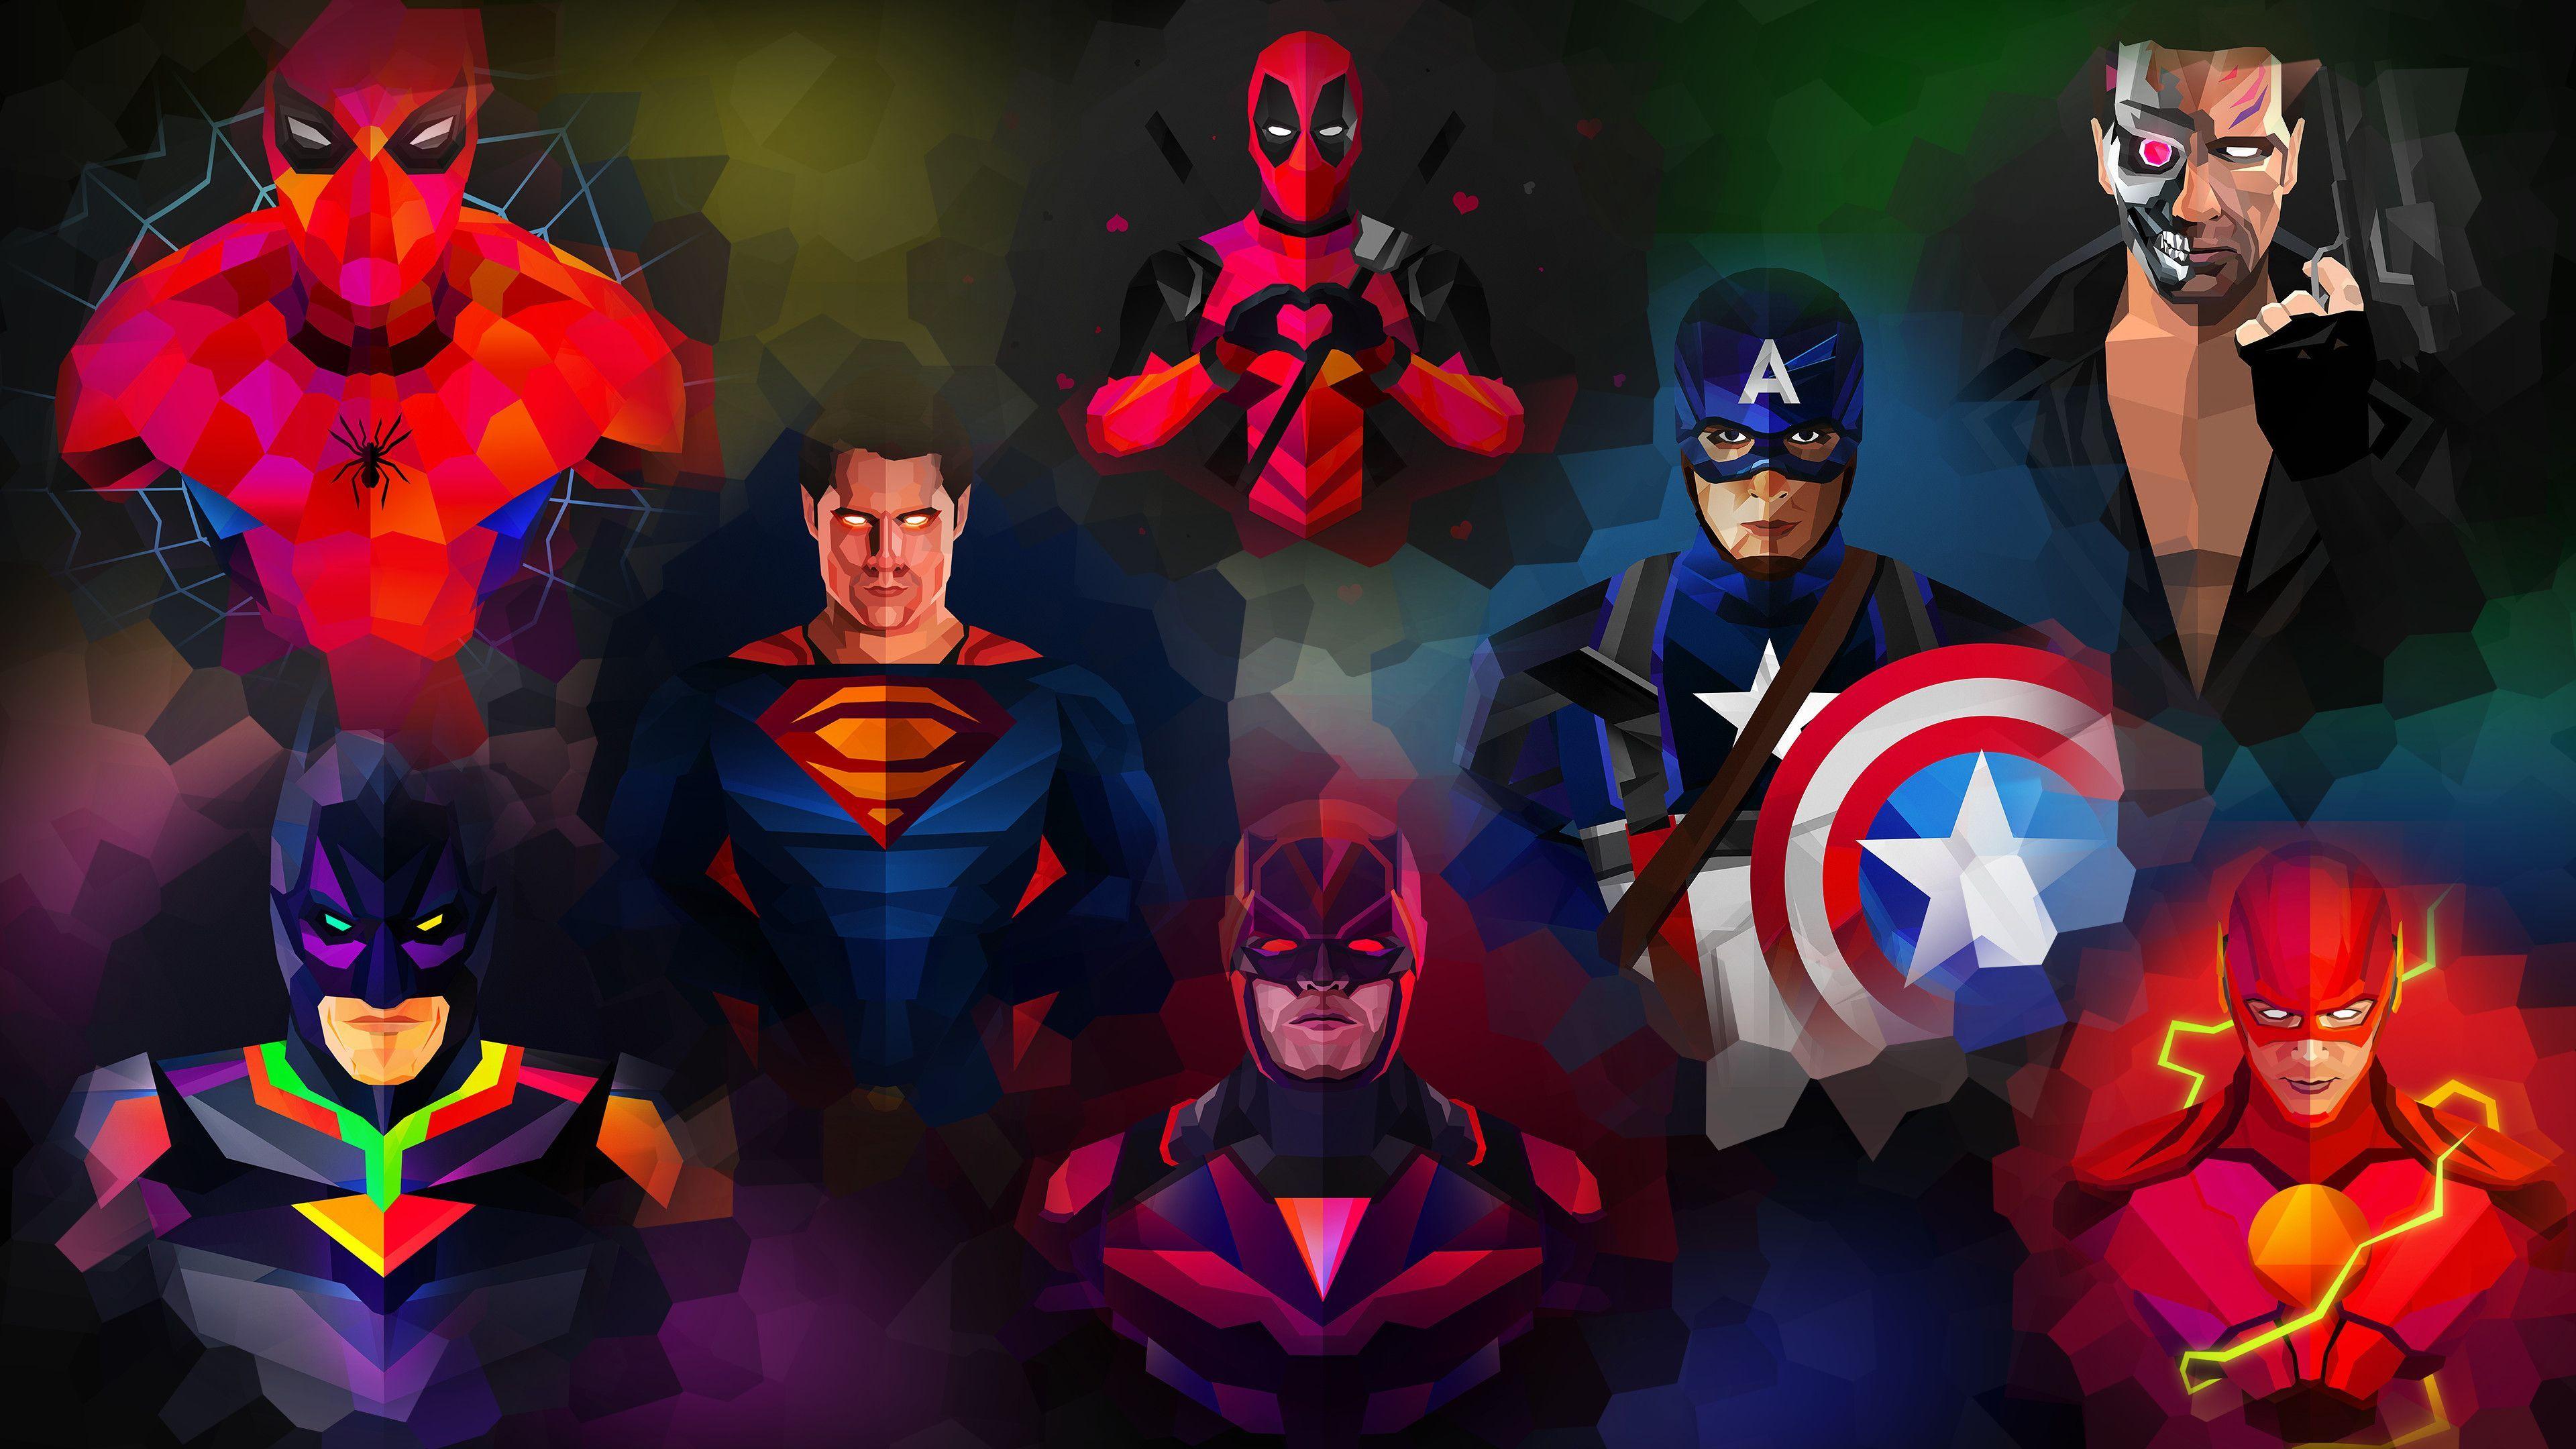 pin by wrr wenna on yt wrr wenna cartoon wallpaper hd marvel wallpaper superhero wallpaper hd pinterest